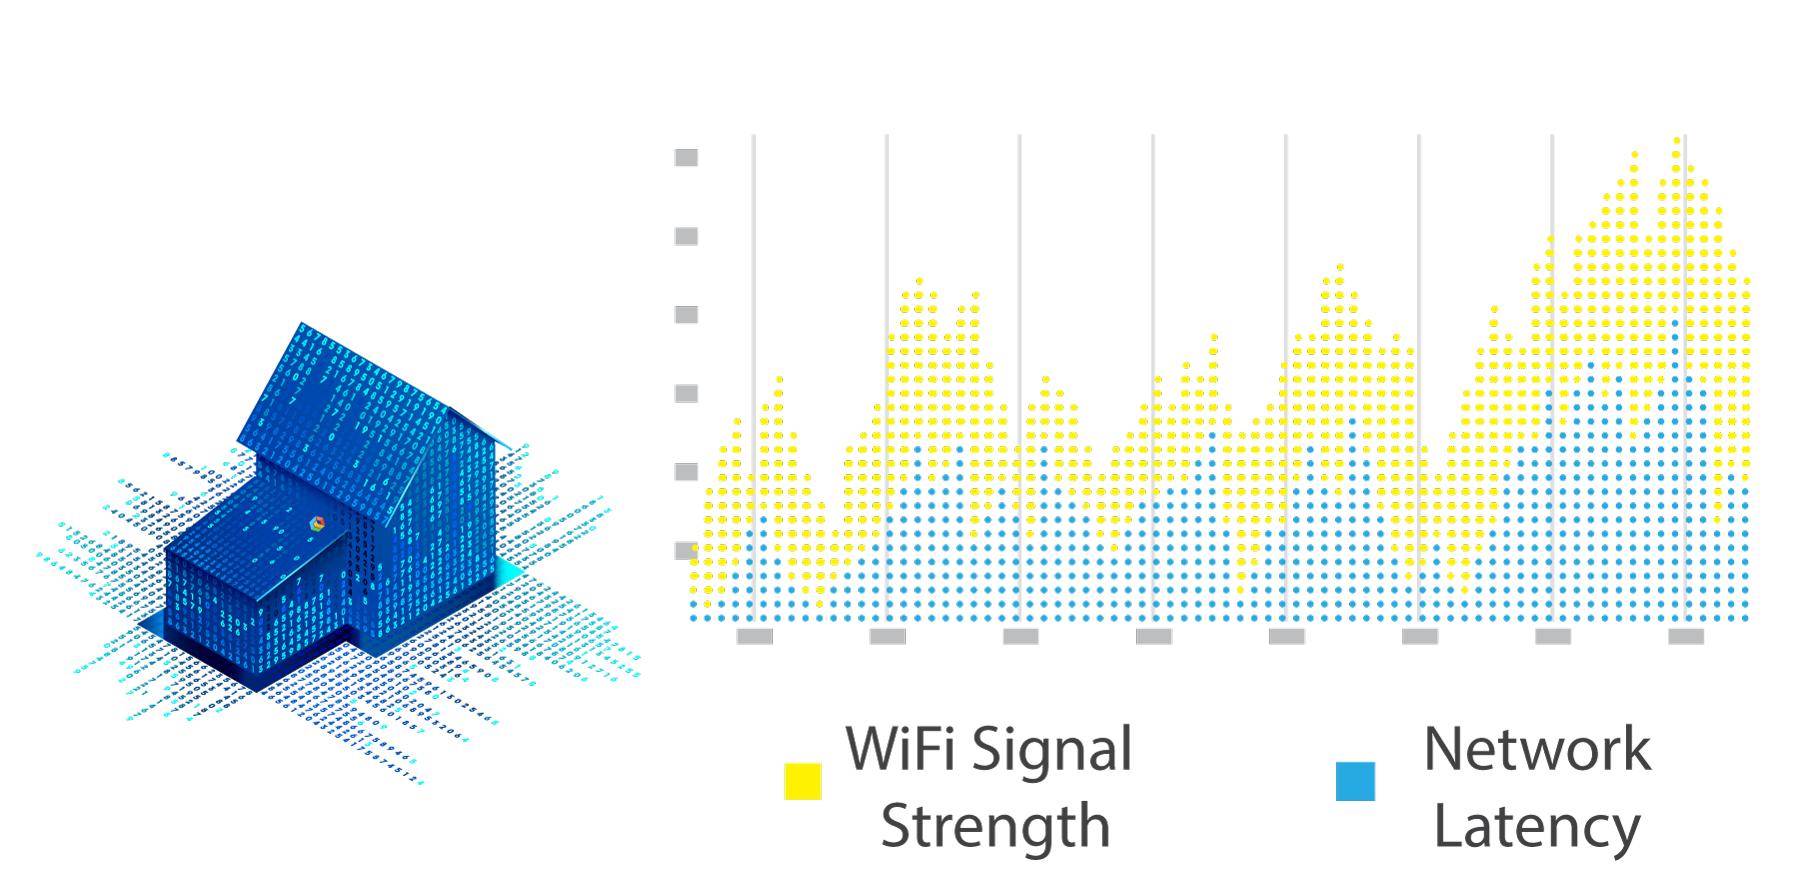 WiFi Signal Strength Performance Monitoring, Latency